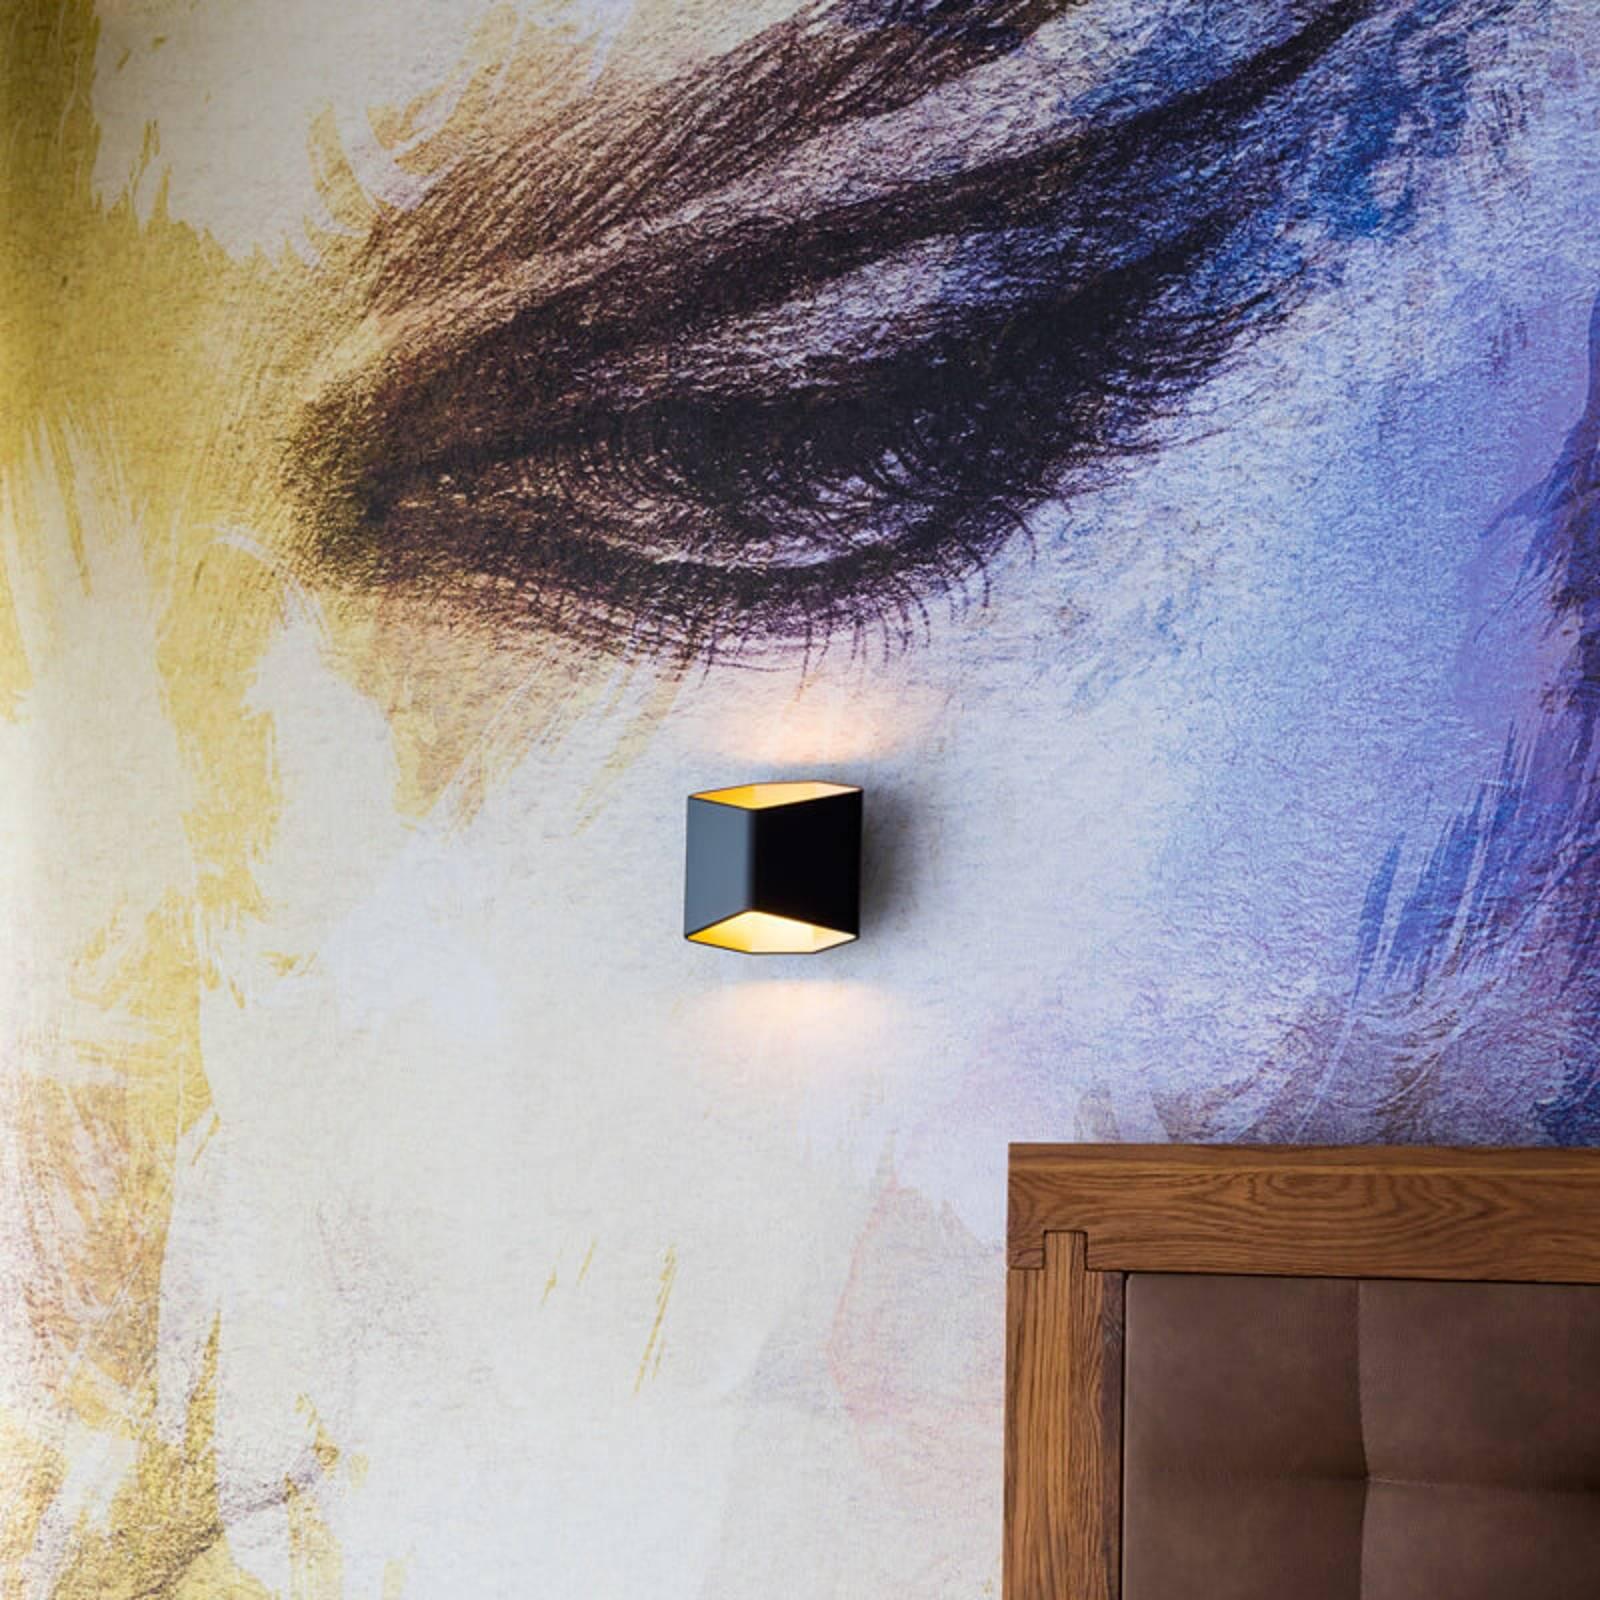 SLV Cariso LED-Wandleuchte schwarz/messing 16,4cm